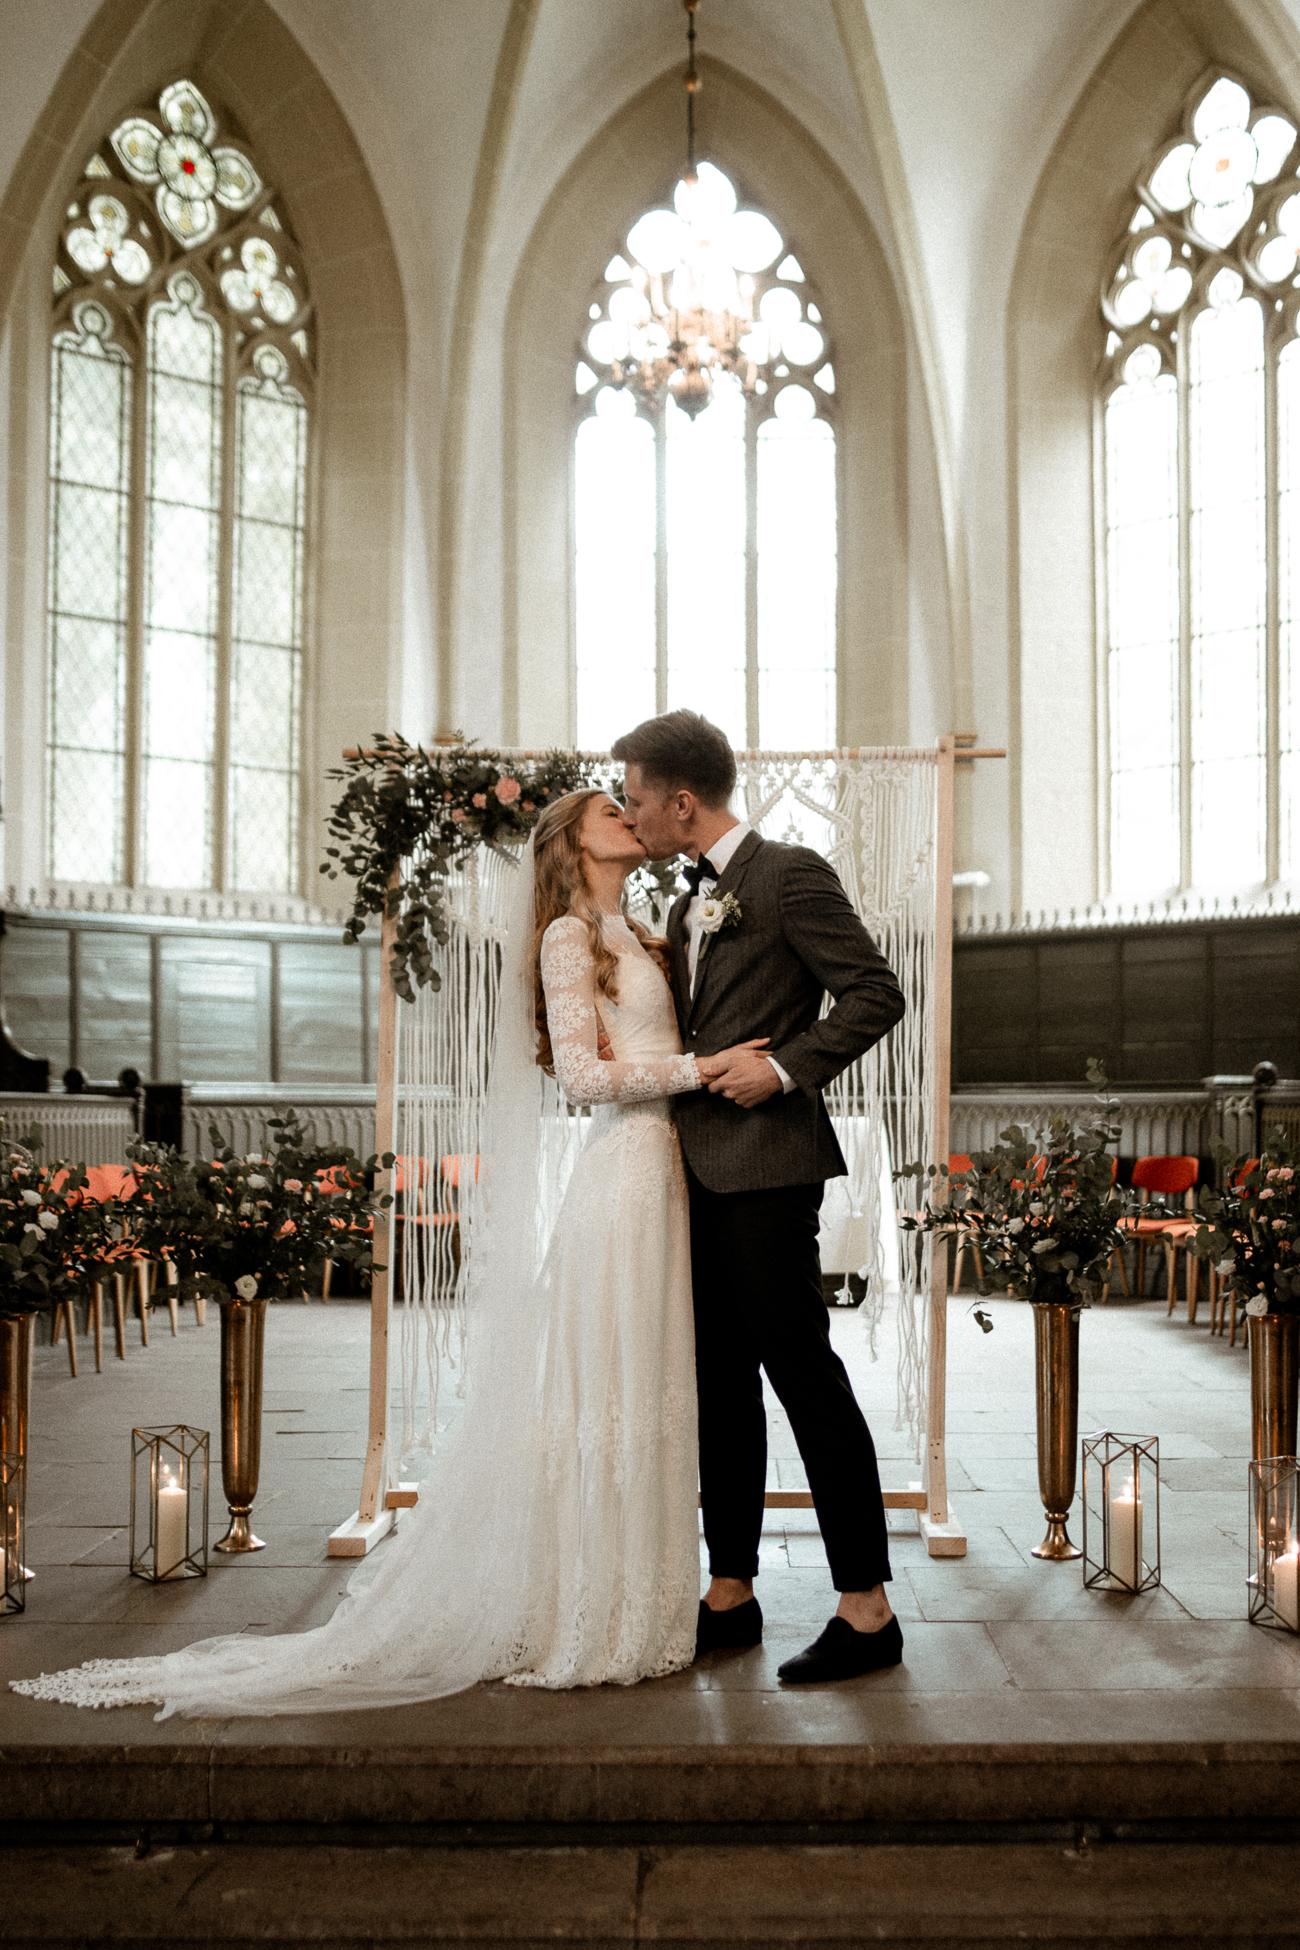 wholeheartedweddings-Timo-Matthies-Sean&Judy-boho-Barnweddings-hochformat-004.jpg